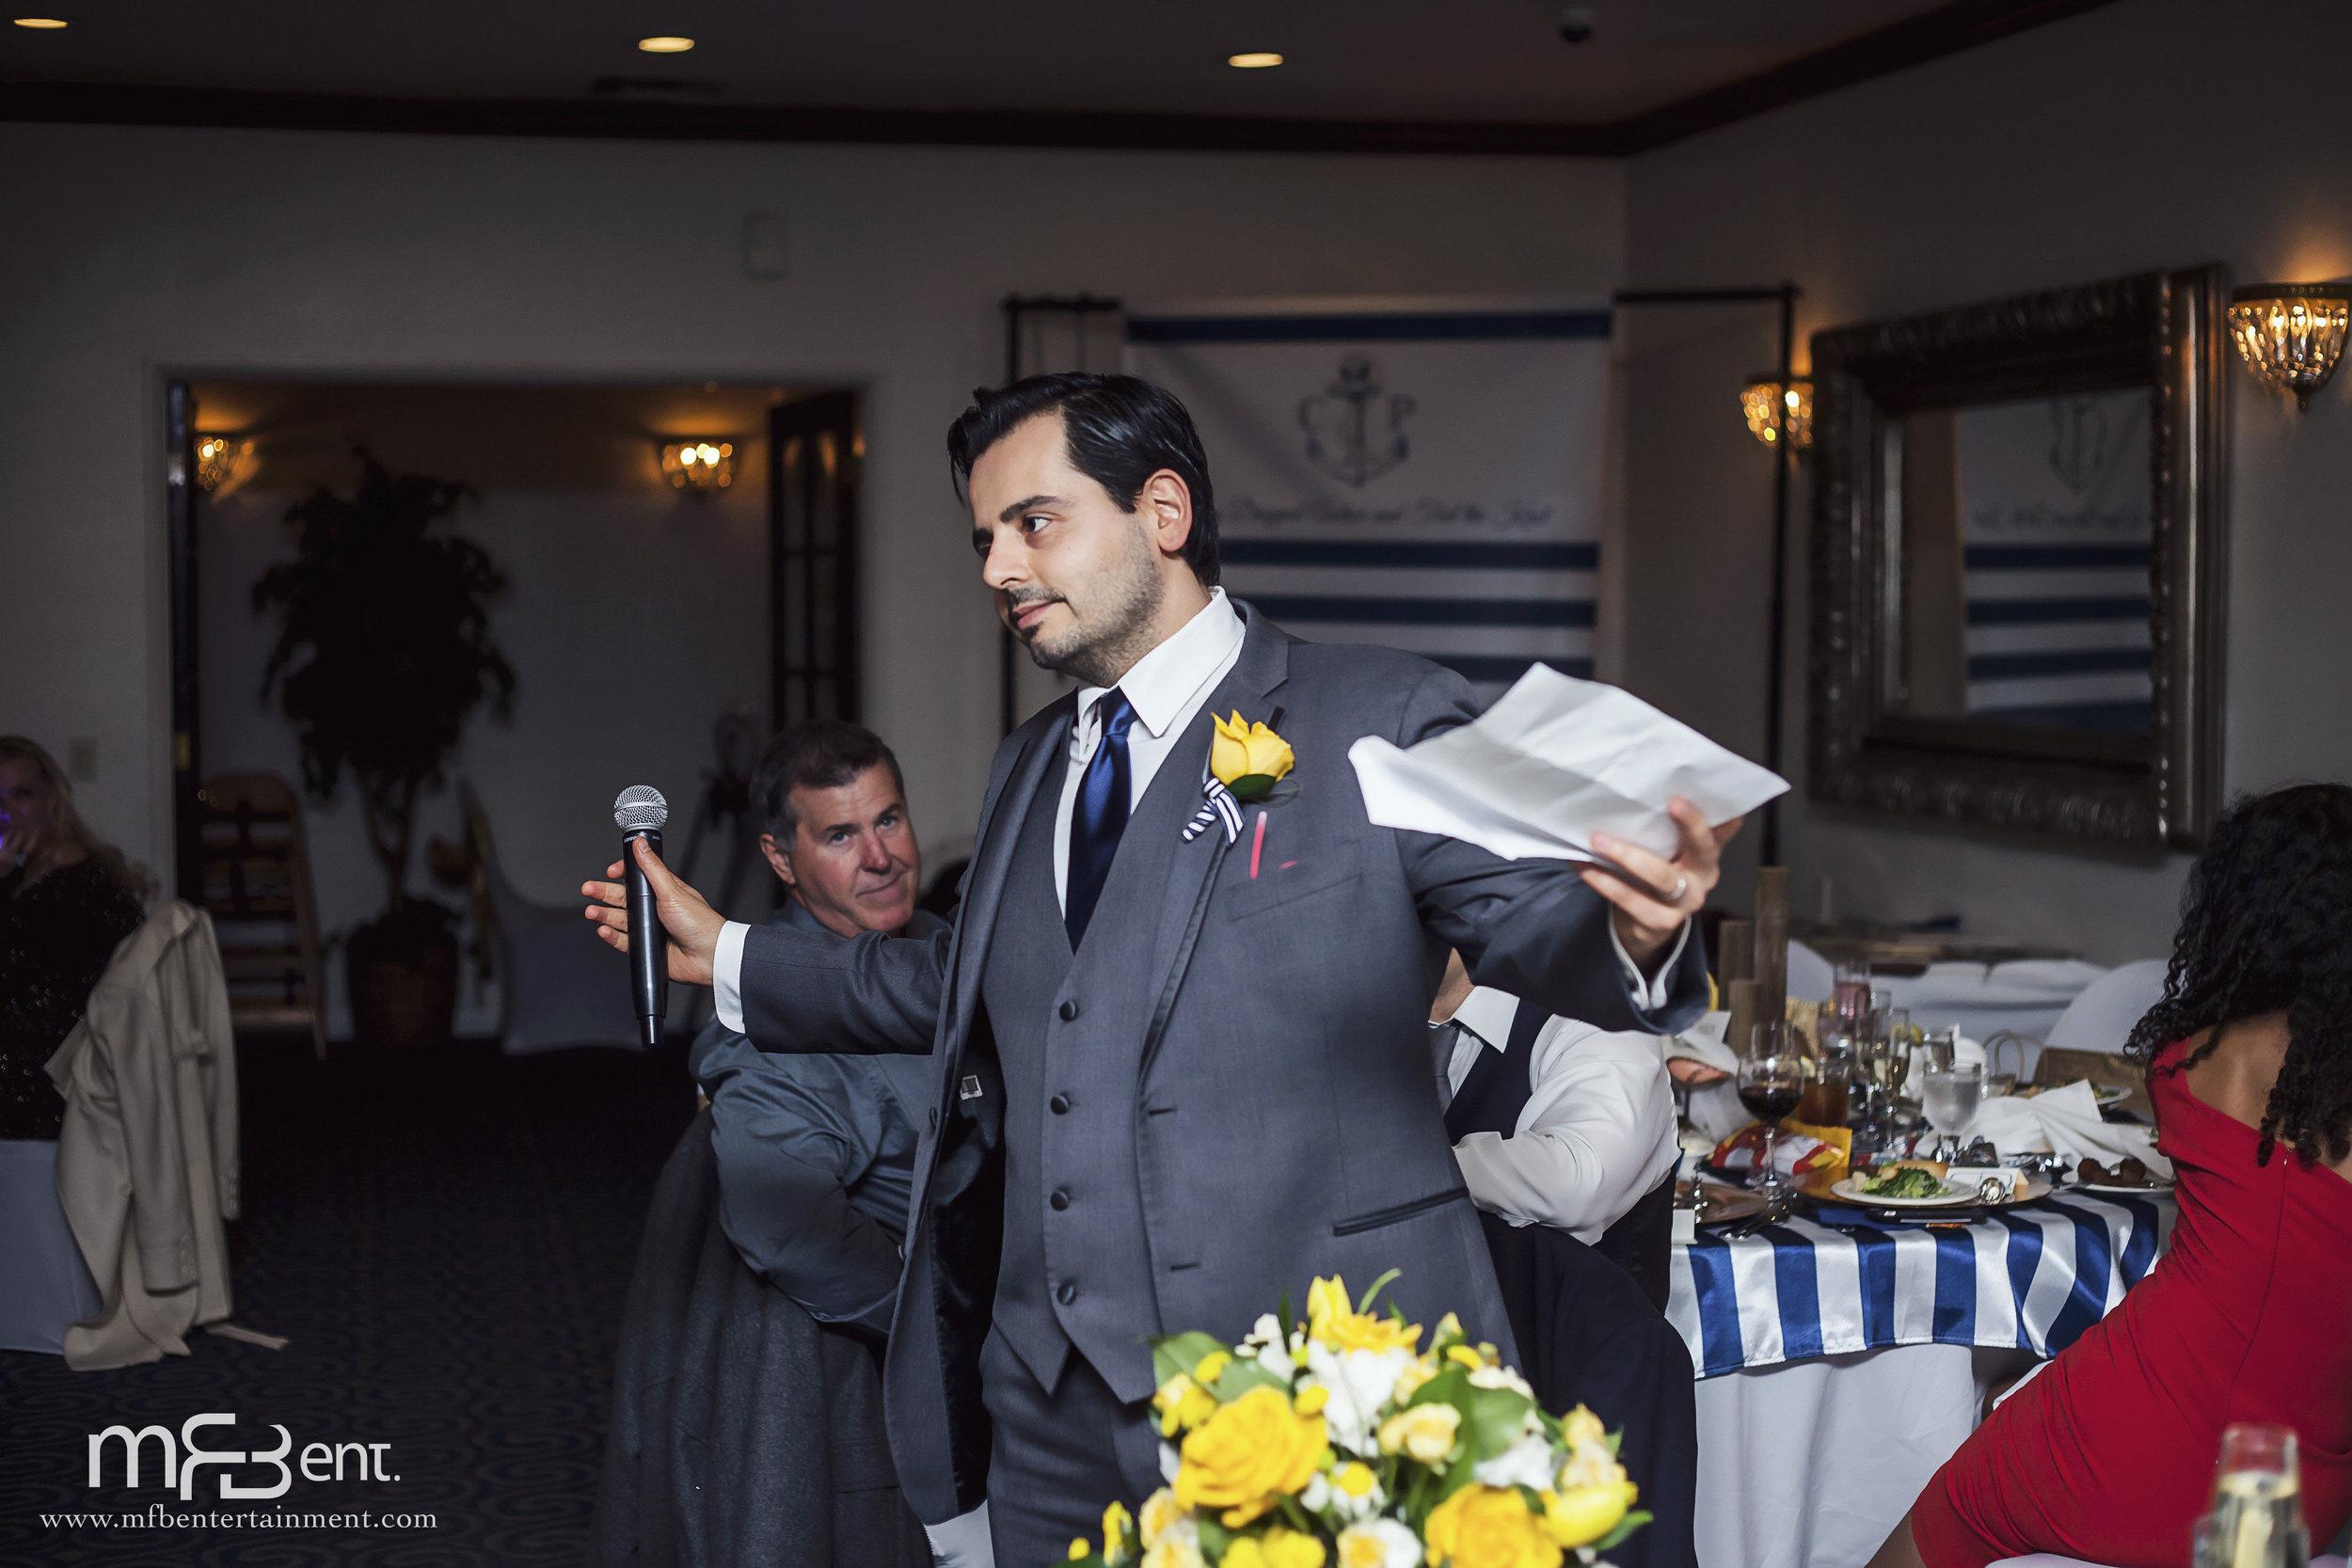 PIOTR CHELSEA WEDDING-RECEPTION-0072 L.jpg